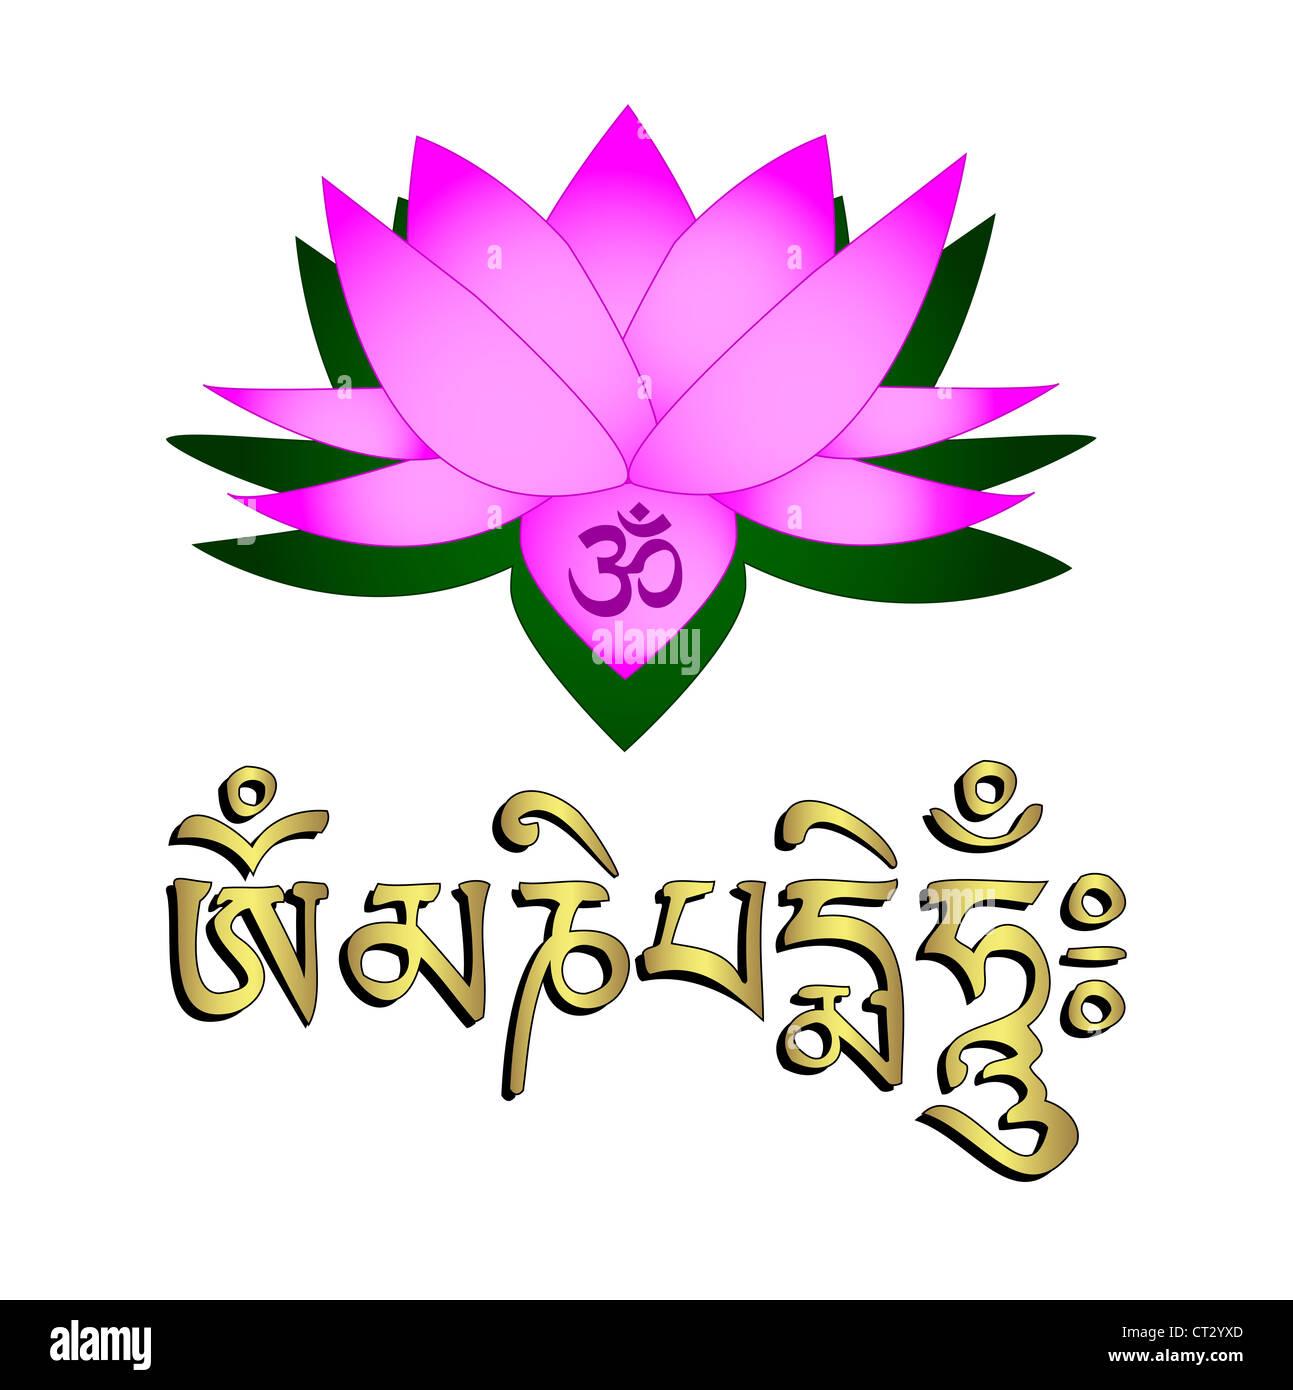 Lotus flower om symbol and mantra om mani padme hum stock photo lotus flower om symbol and mantra om mani padme hum mightylinksfo